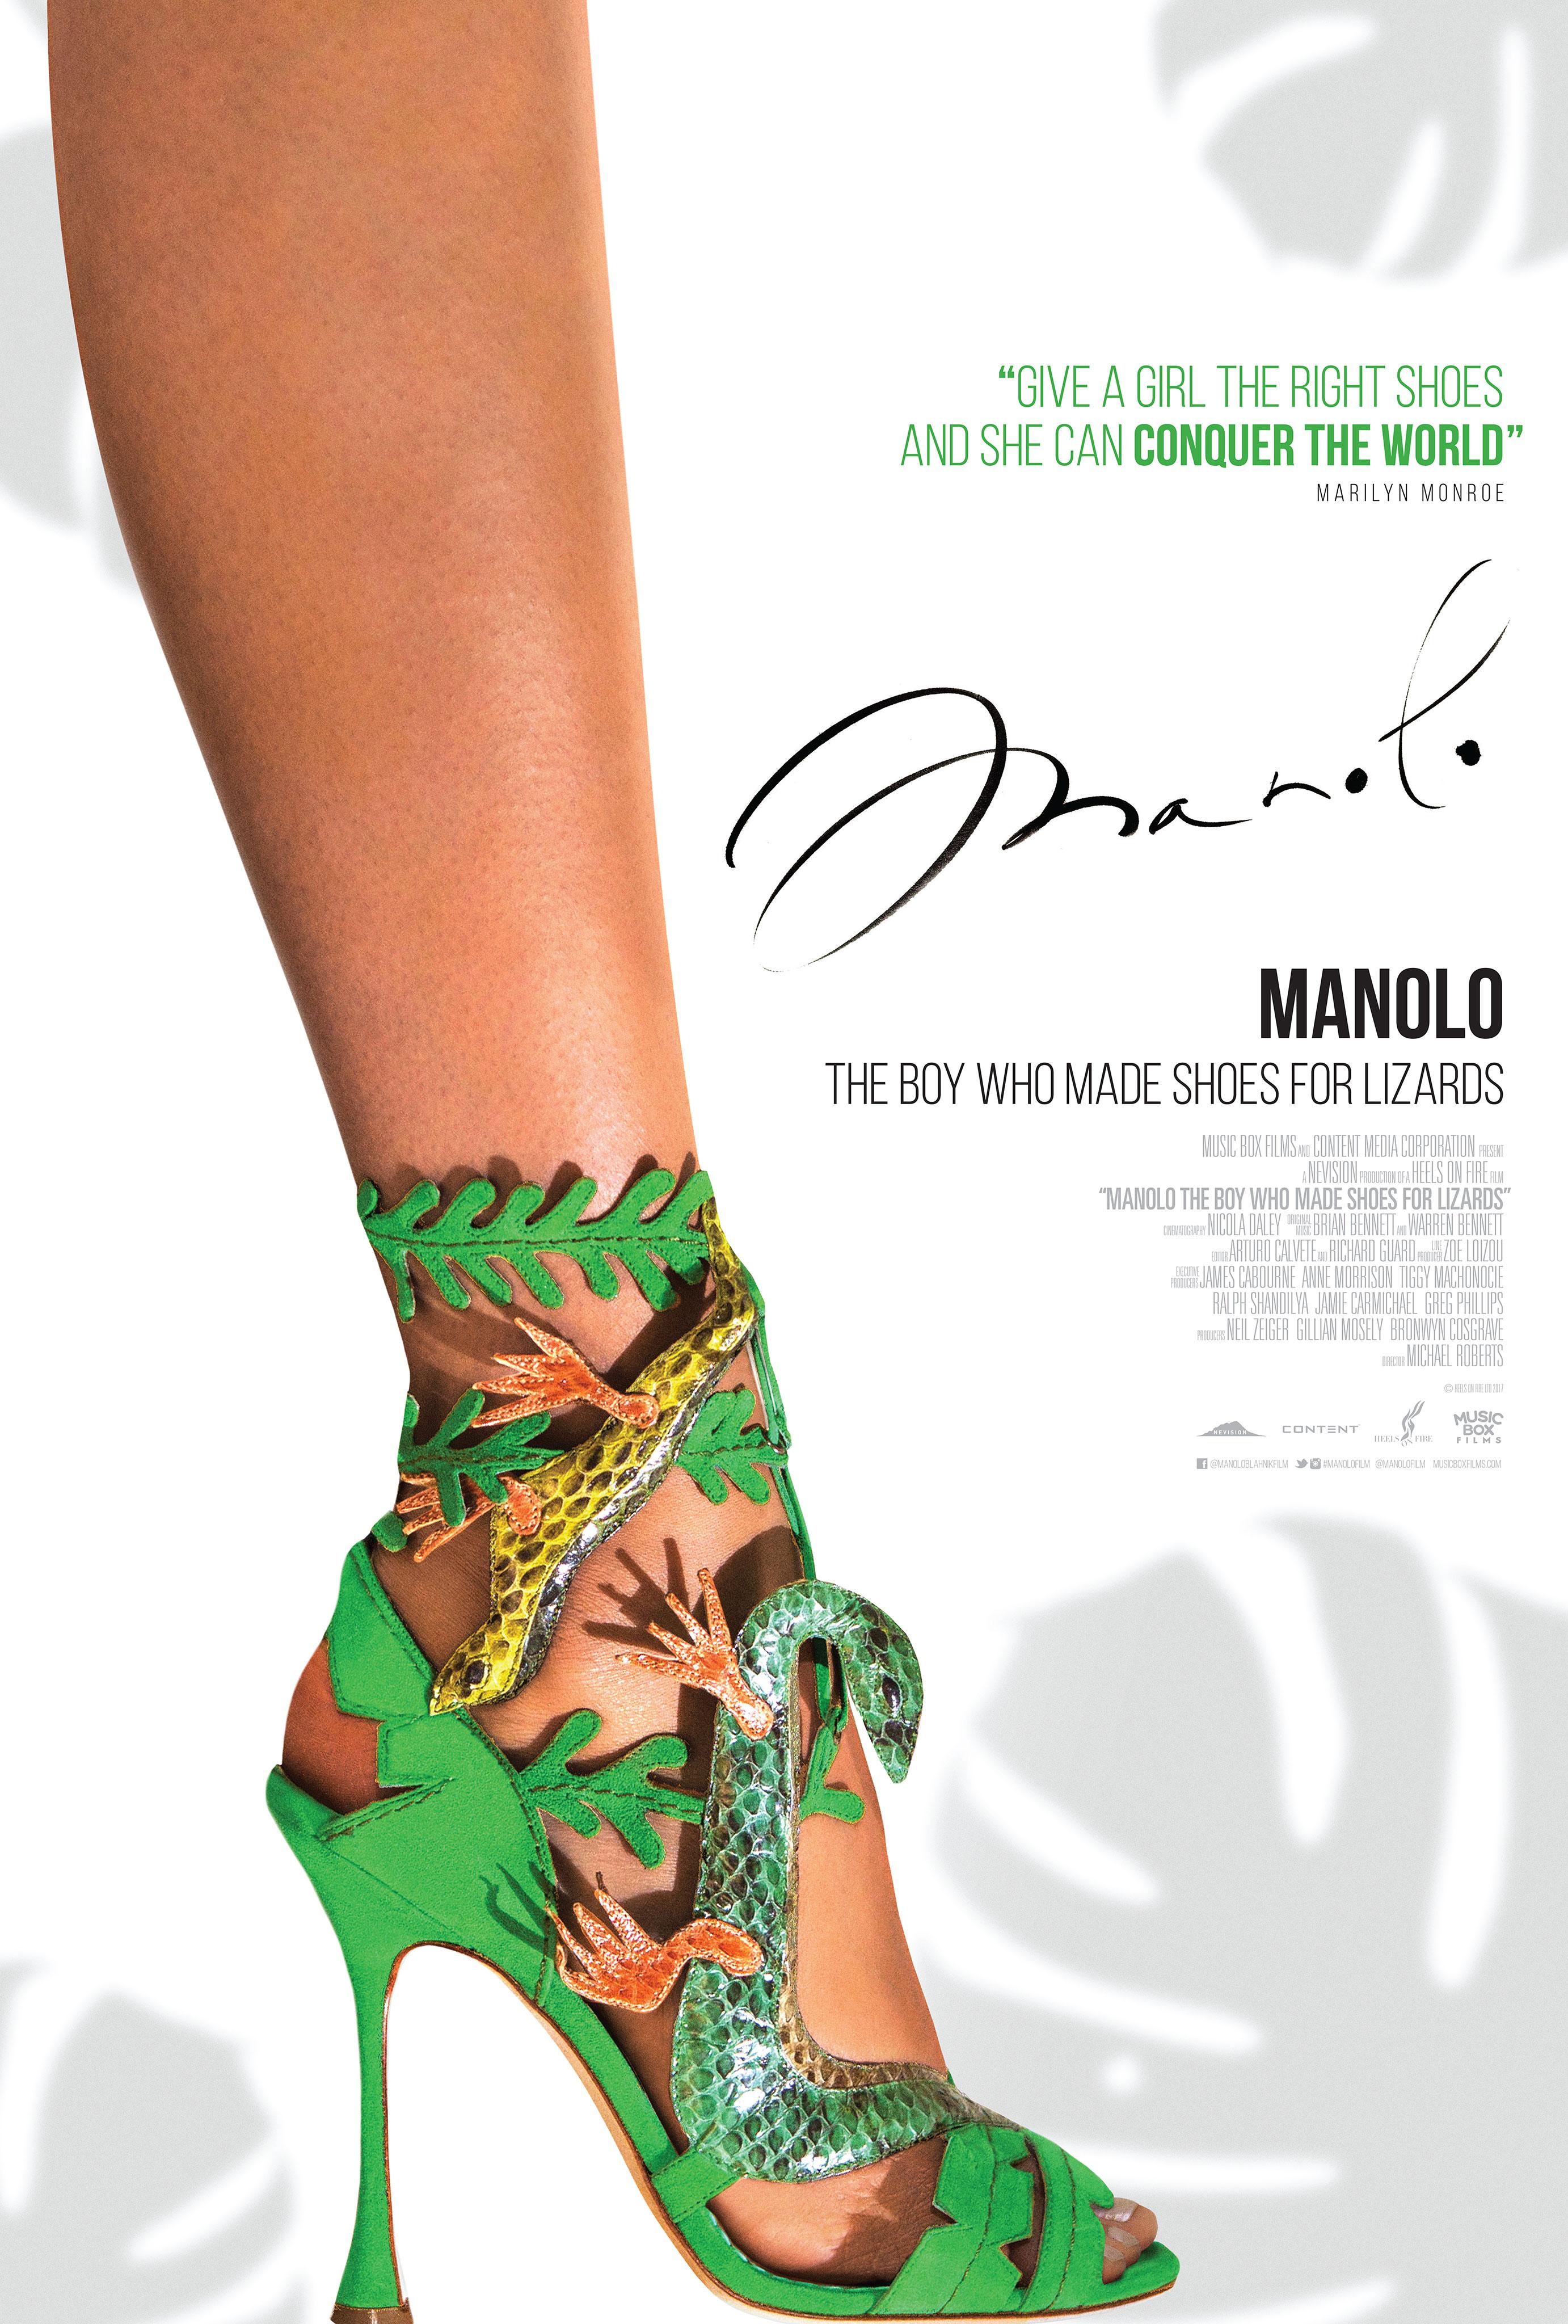 37909f655e Manolo: The Boy Who Made Shoes for Lizards (2017) - IMDb